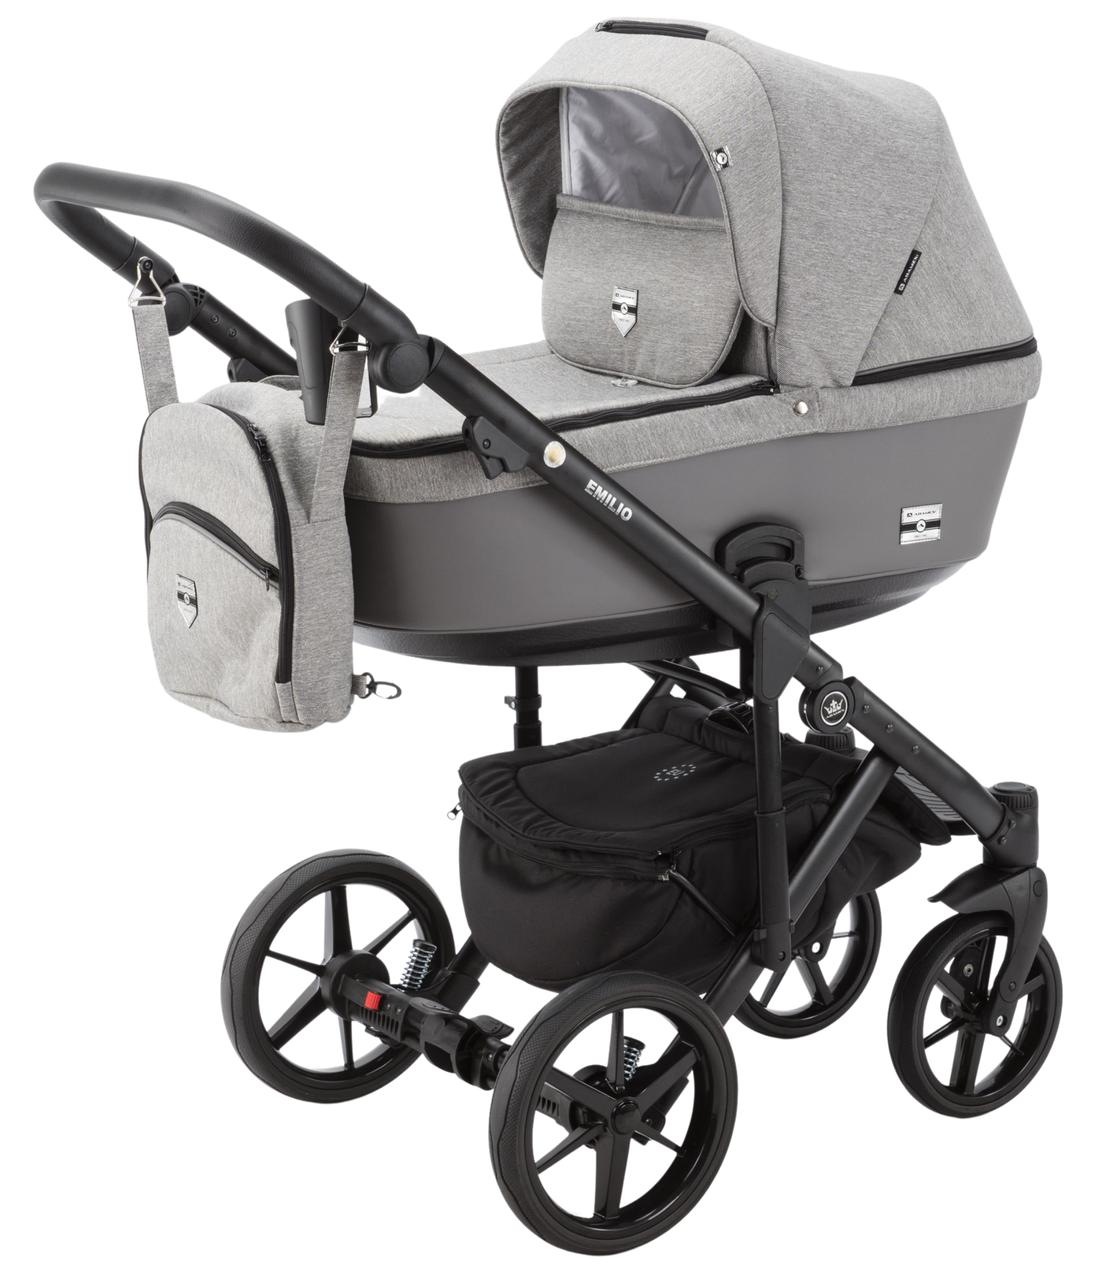 Дитяча універсальна коляска 2 в 1 Adamex Emilio EM-250